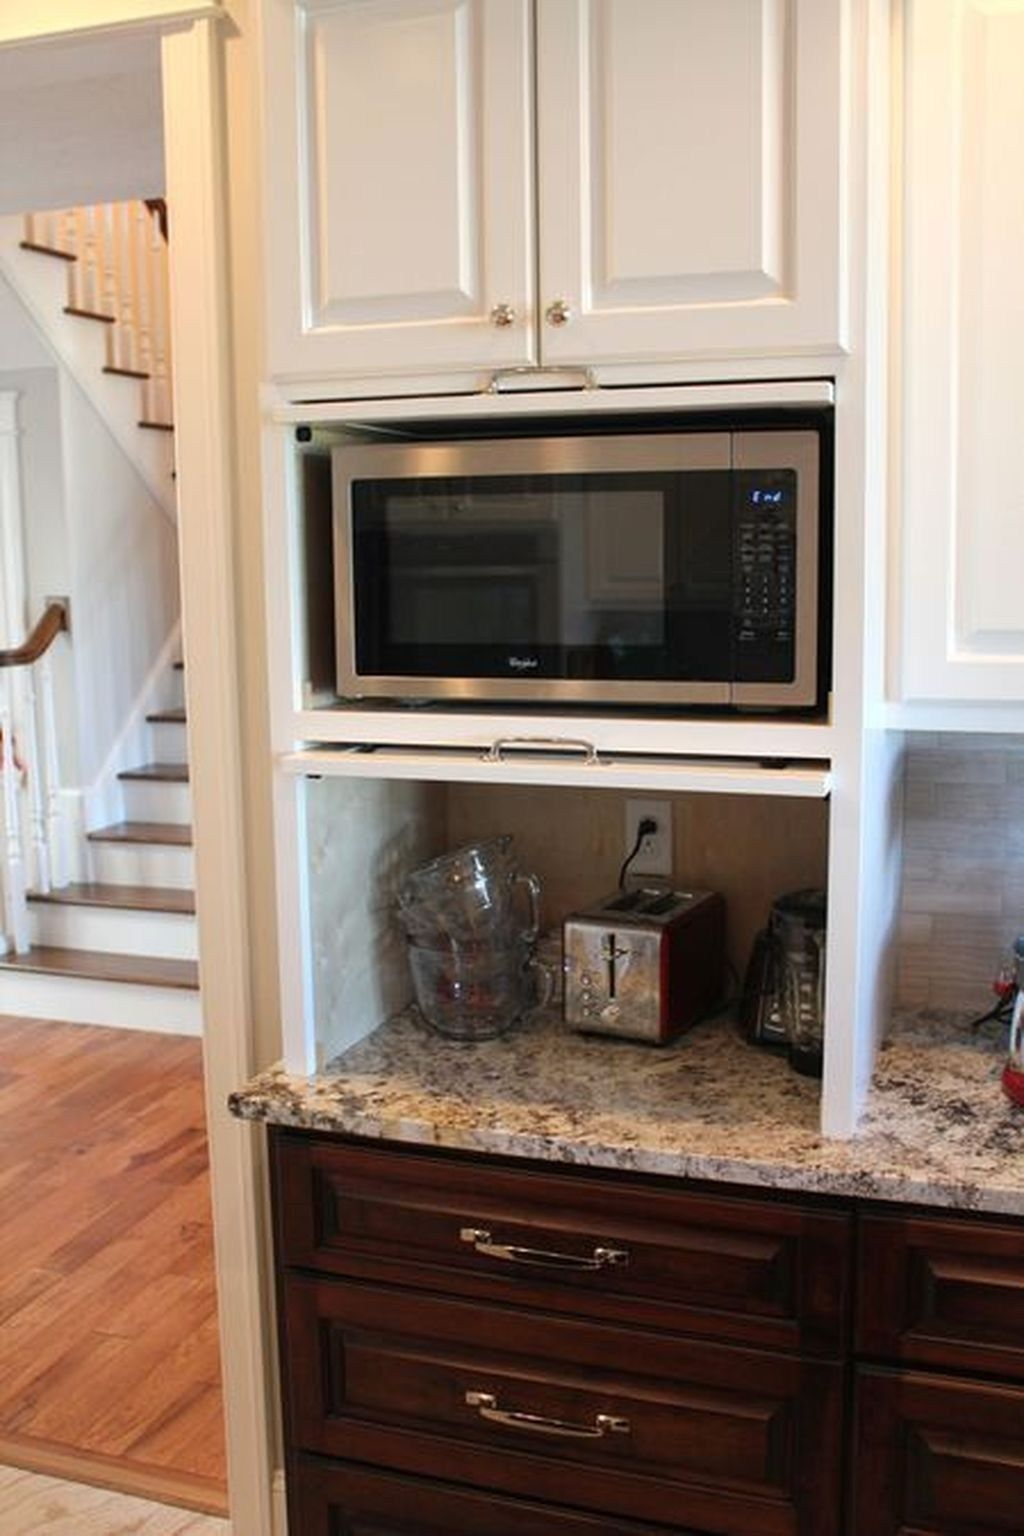 30 Astonishing Hidden Kitchen Storage Ideas You Must Have Coodecor Hidden Kitchen Small Kitchen Storage Kitchen Renovation